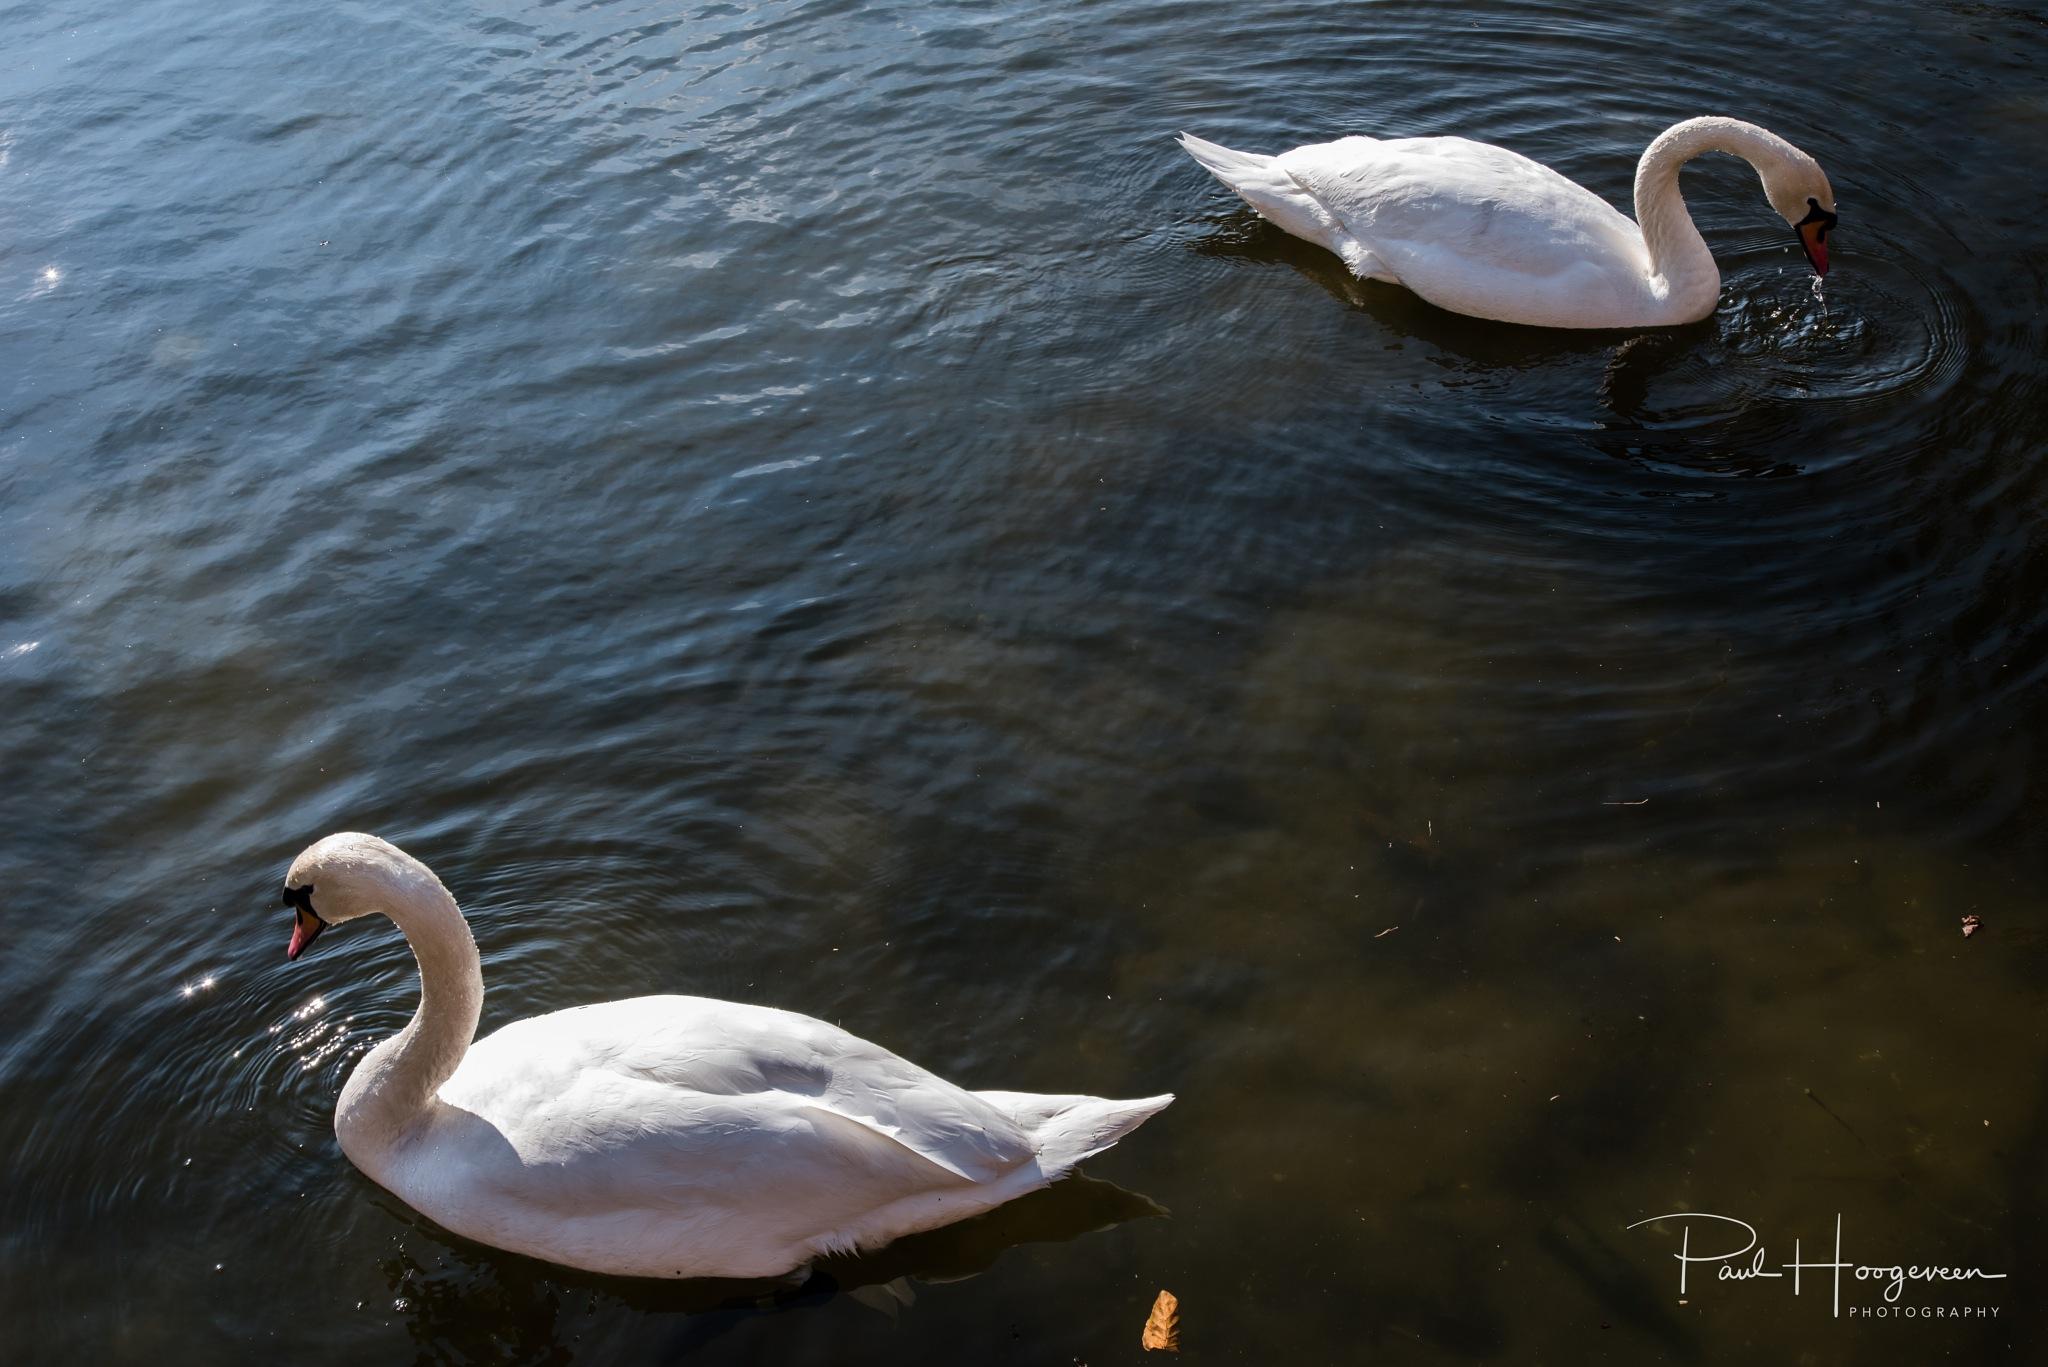 Swan symmetry by Paul Hoogeveen Photography